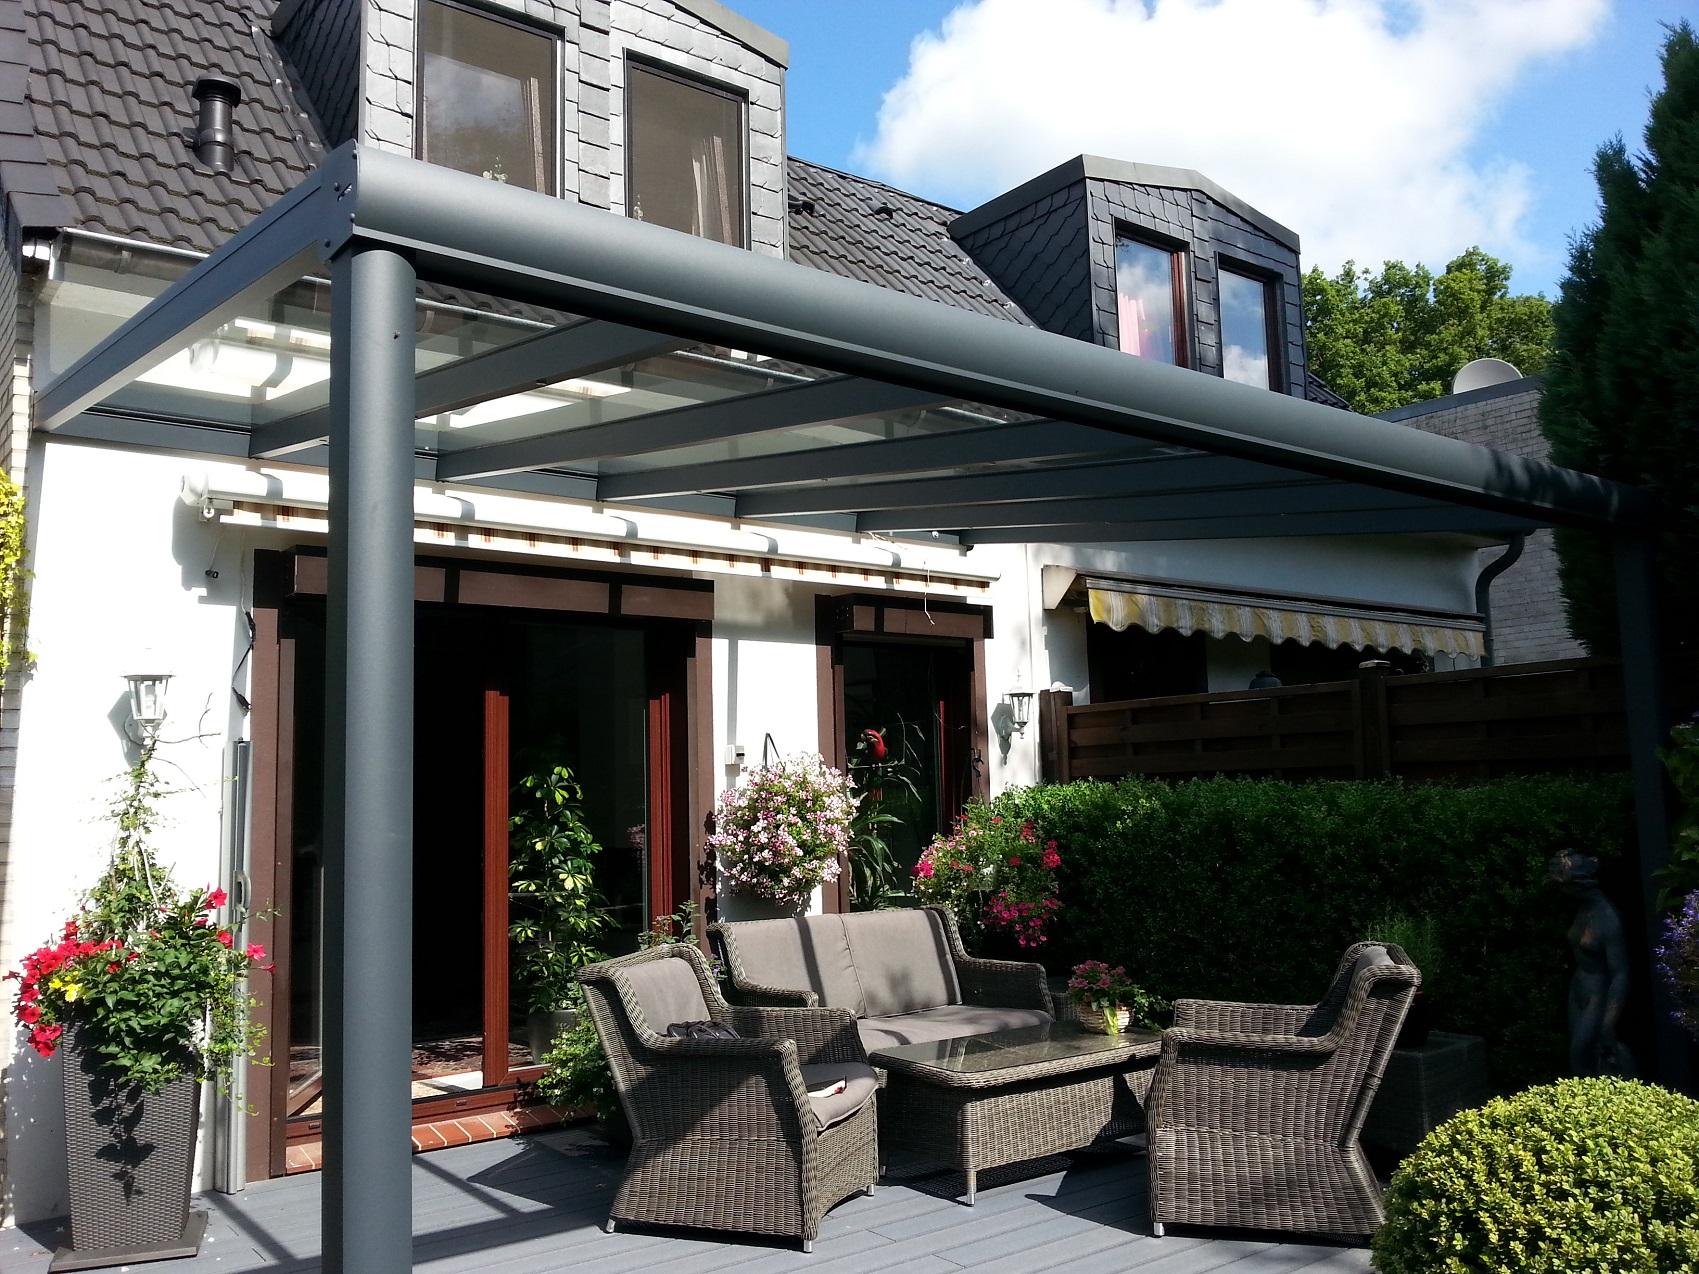 galerie terrassendach carport nord carport hamburg. Black Bedroom Furniture Sets. Home Design Ideas